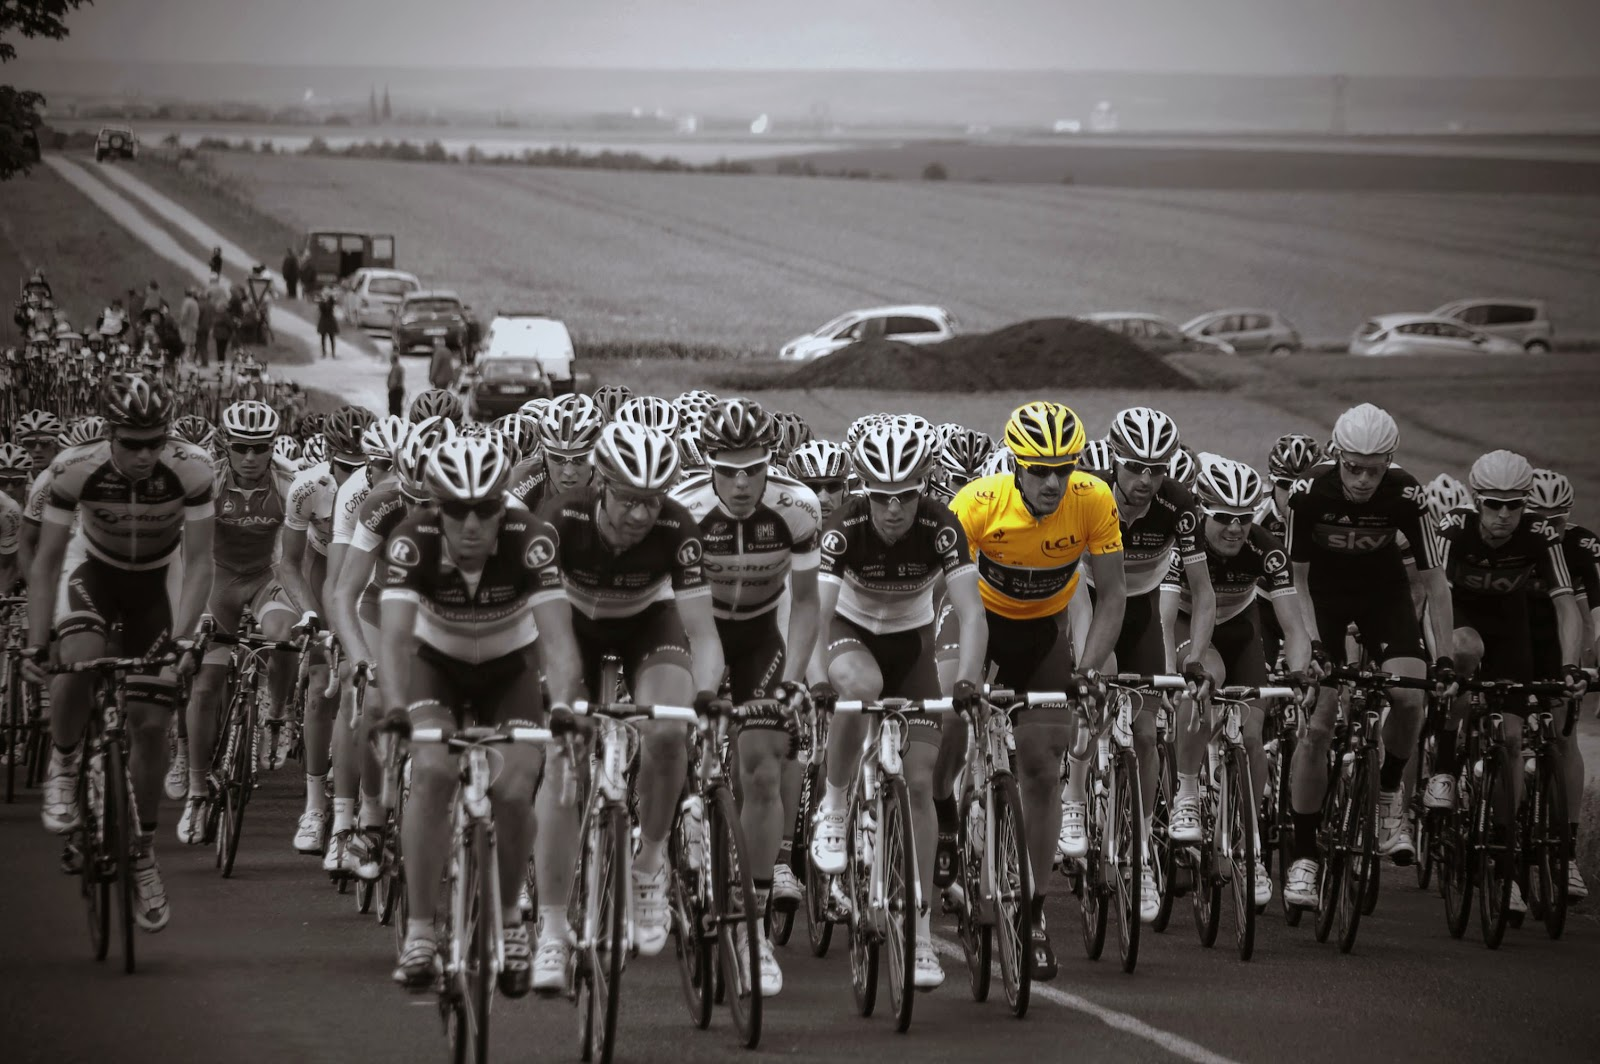 Tour De France hd wallpaper